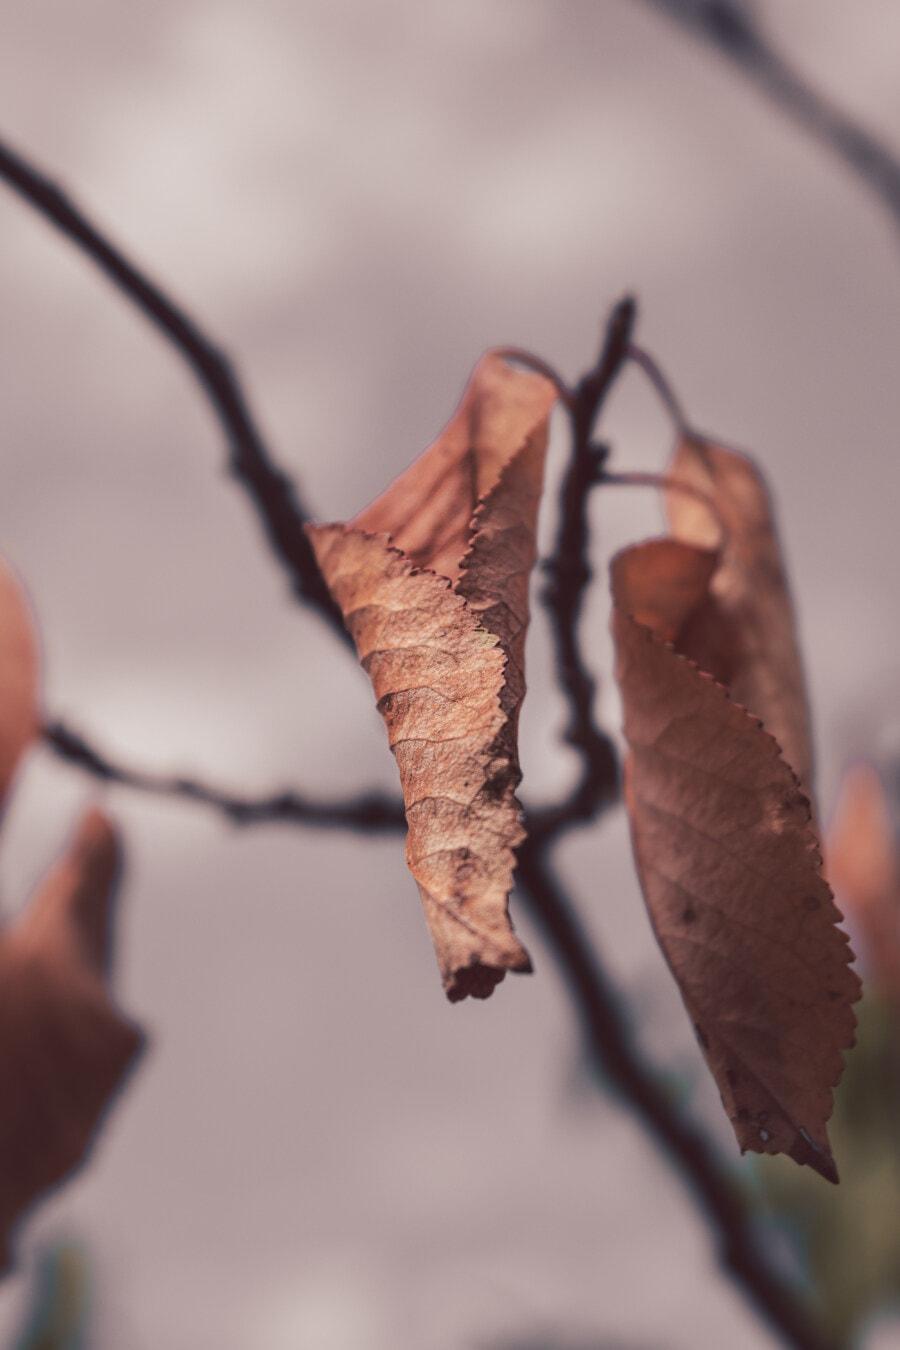 yellow leaves, dry season, autumn season, branches, leaf, nature, tree, outdoors, blur, wood